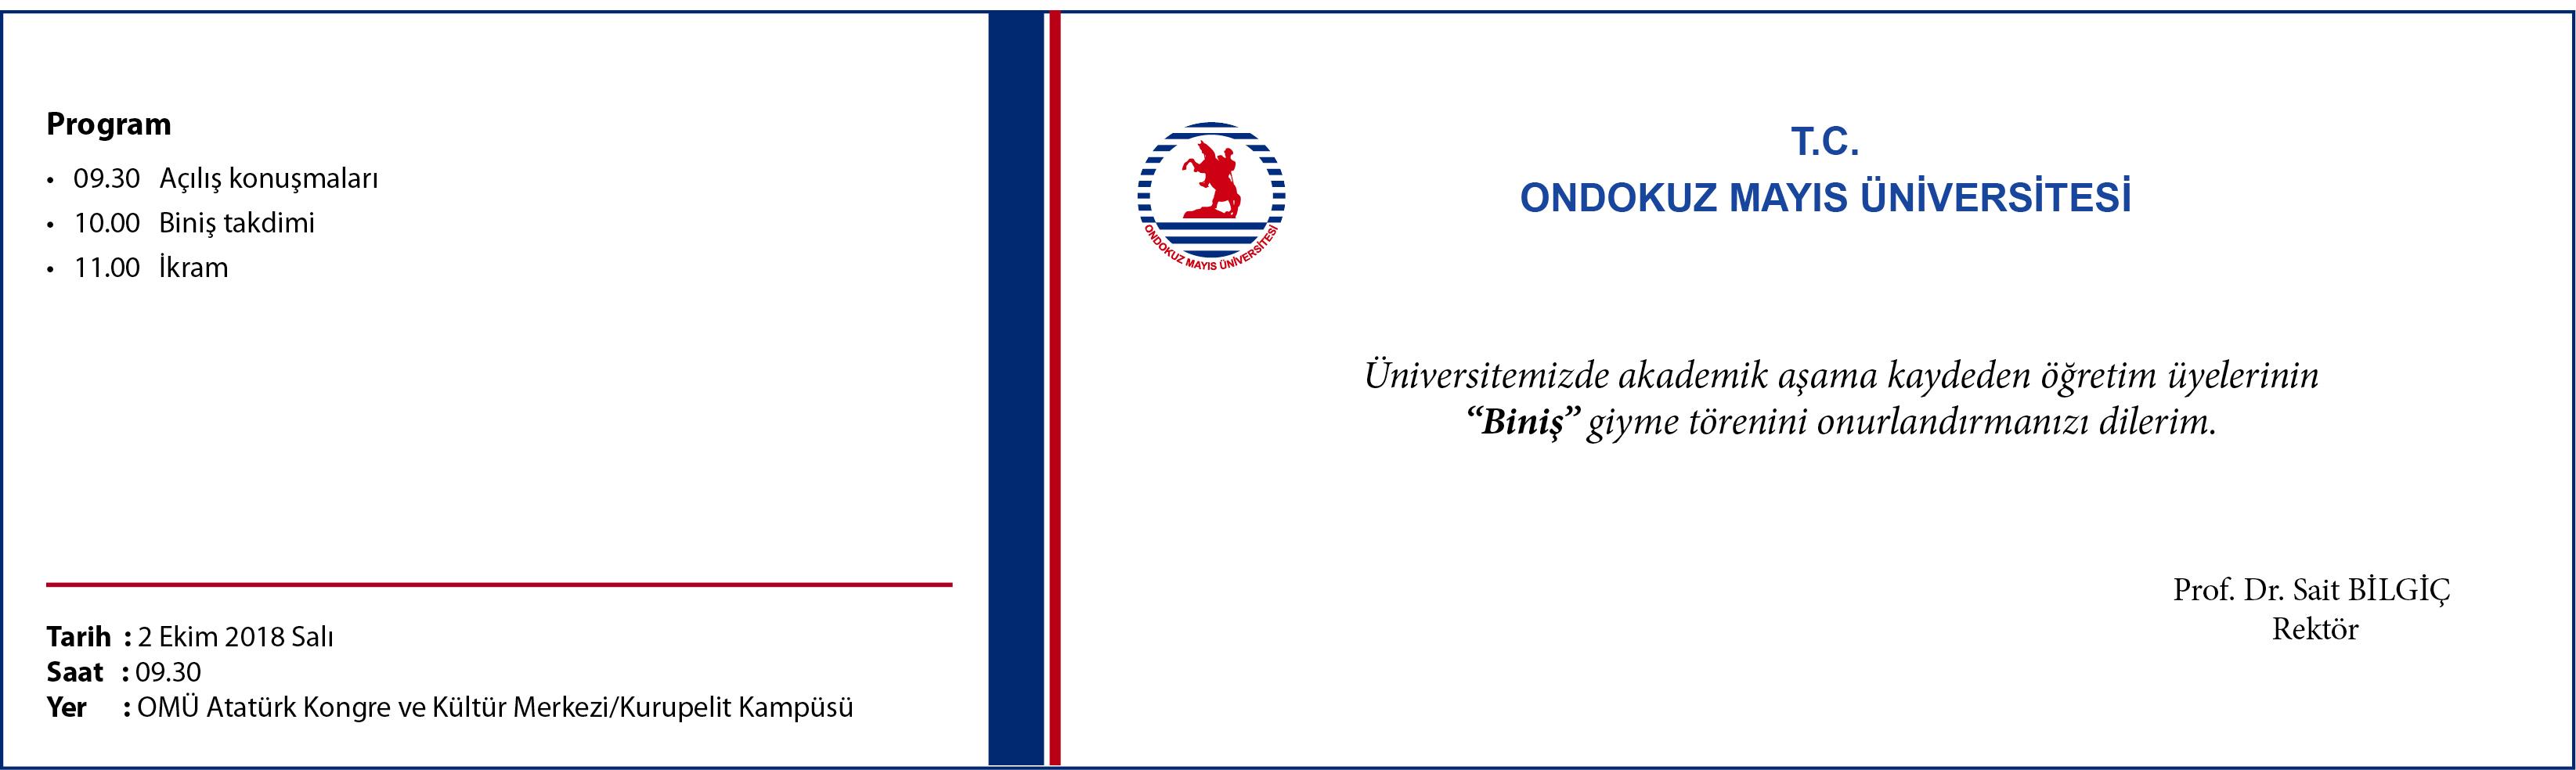 http://www.omu.edu.tr/sites/default/files/omu_binis_takdim_toreni_2018_davet.jpg